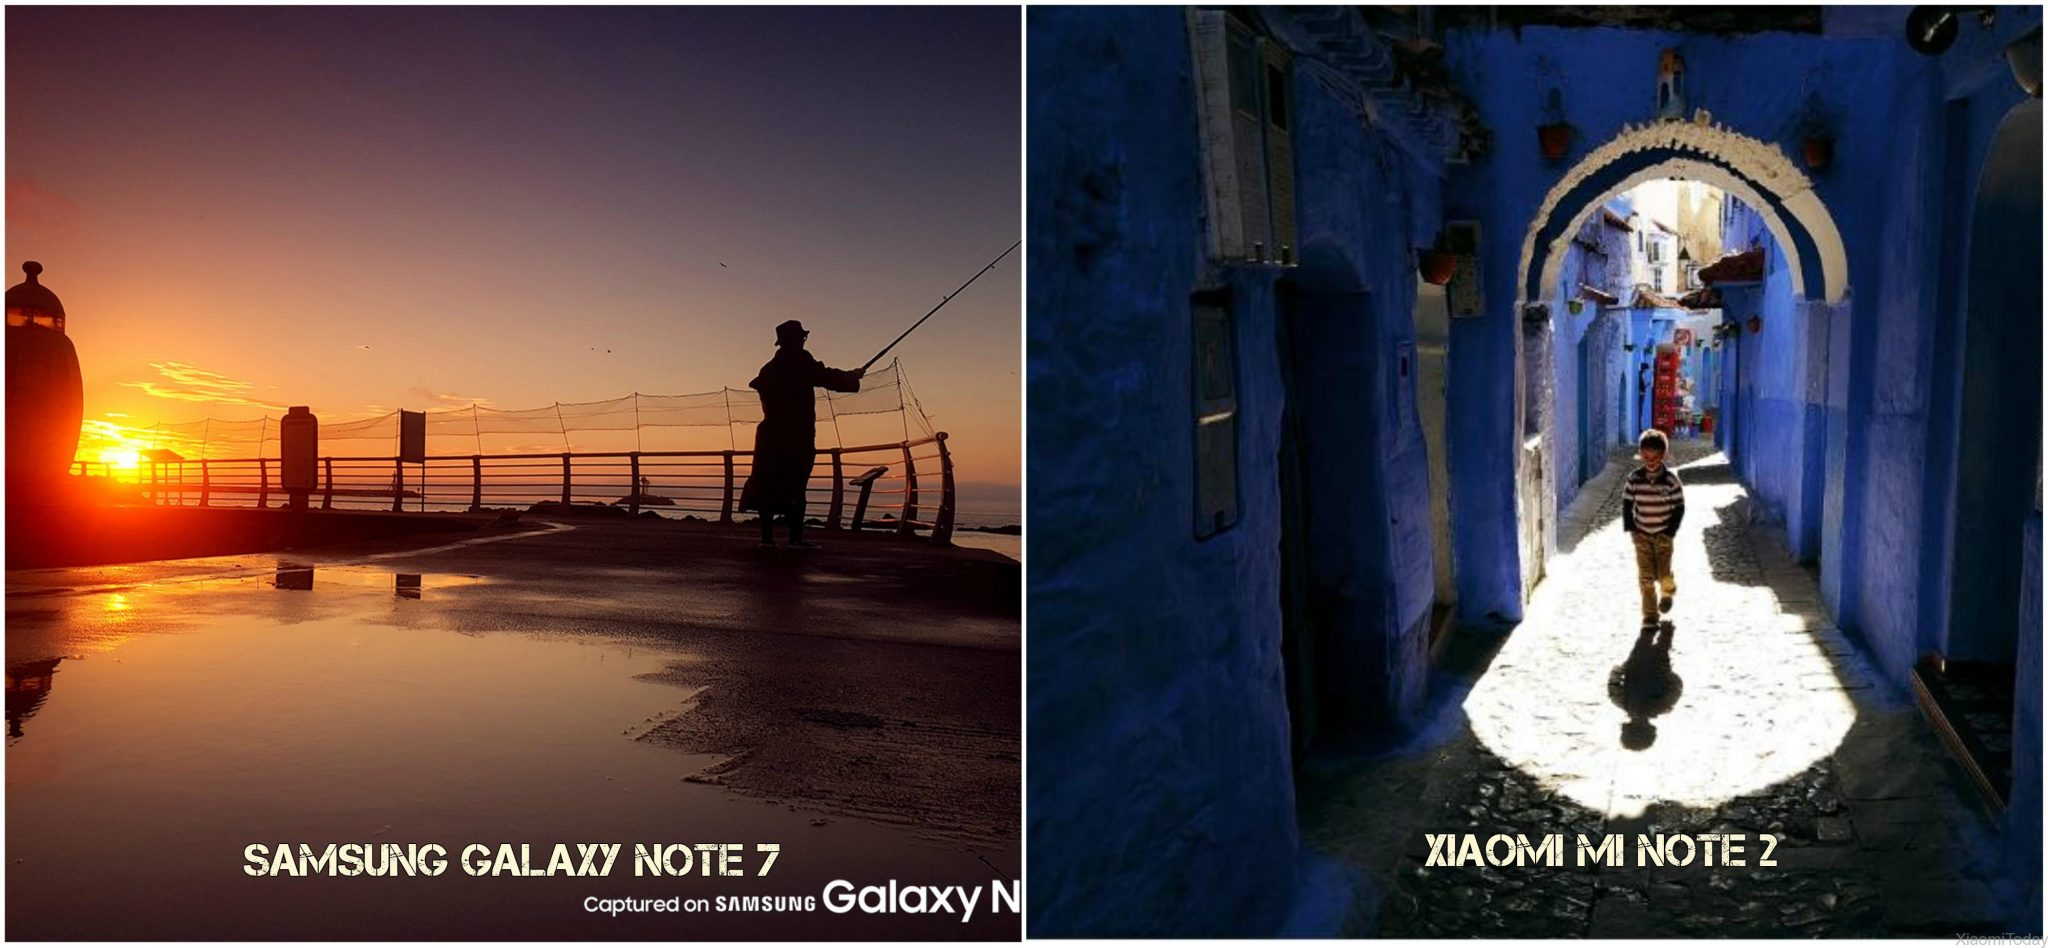 Samsung Galaxy Note 7 VS Xiaomi Mi Note 2 camara